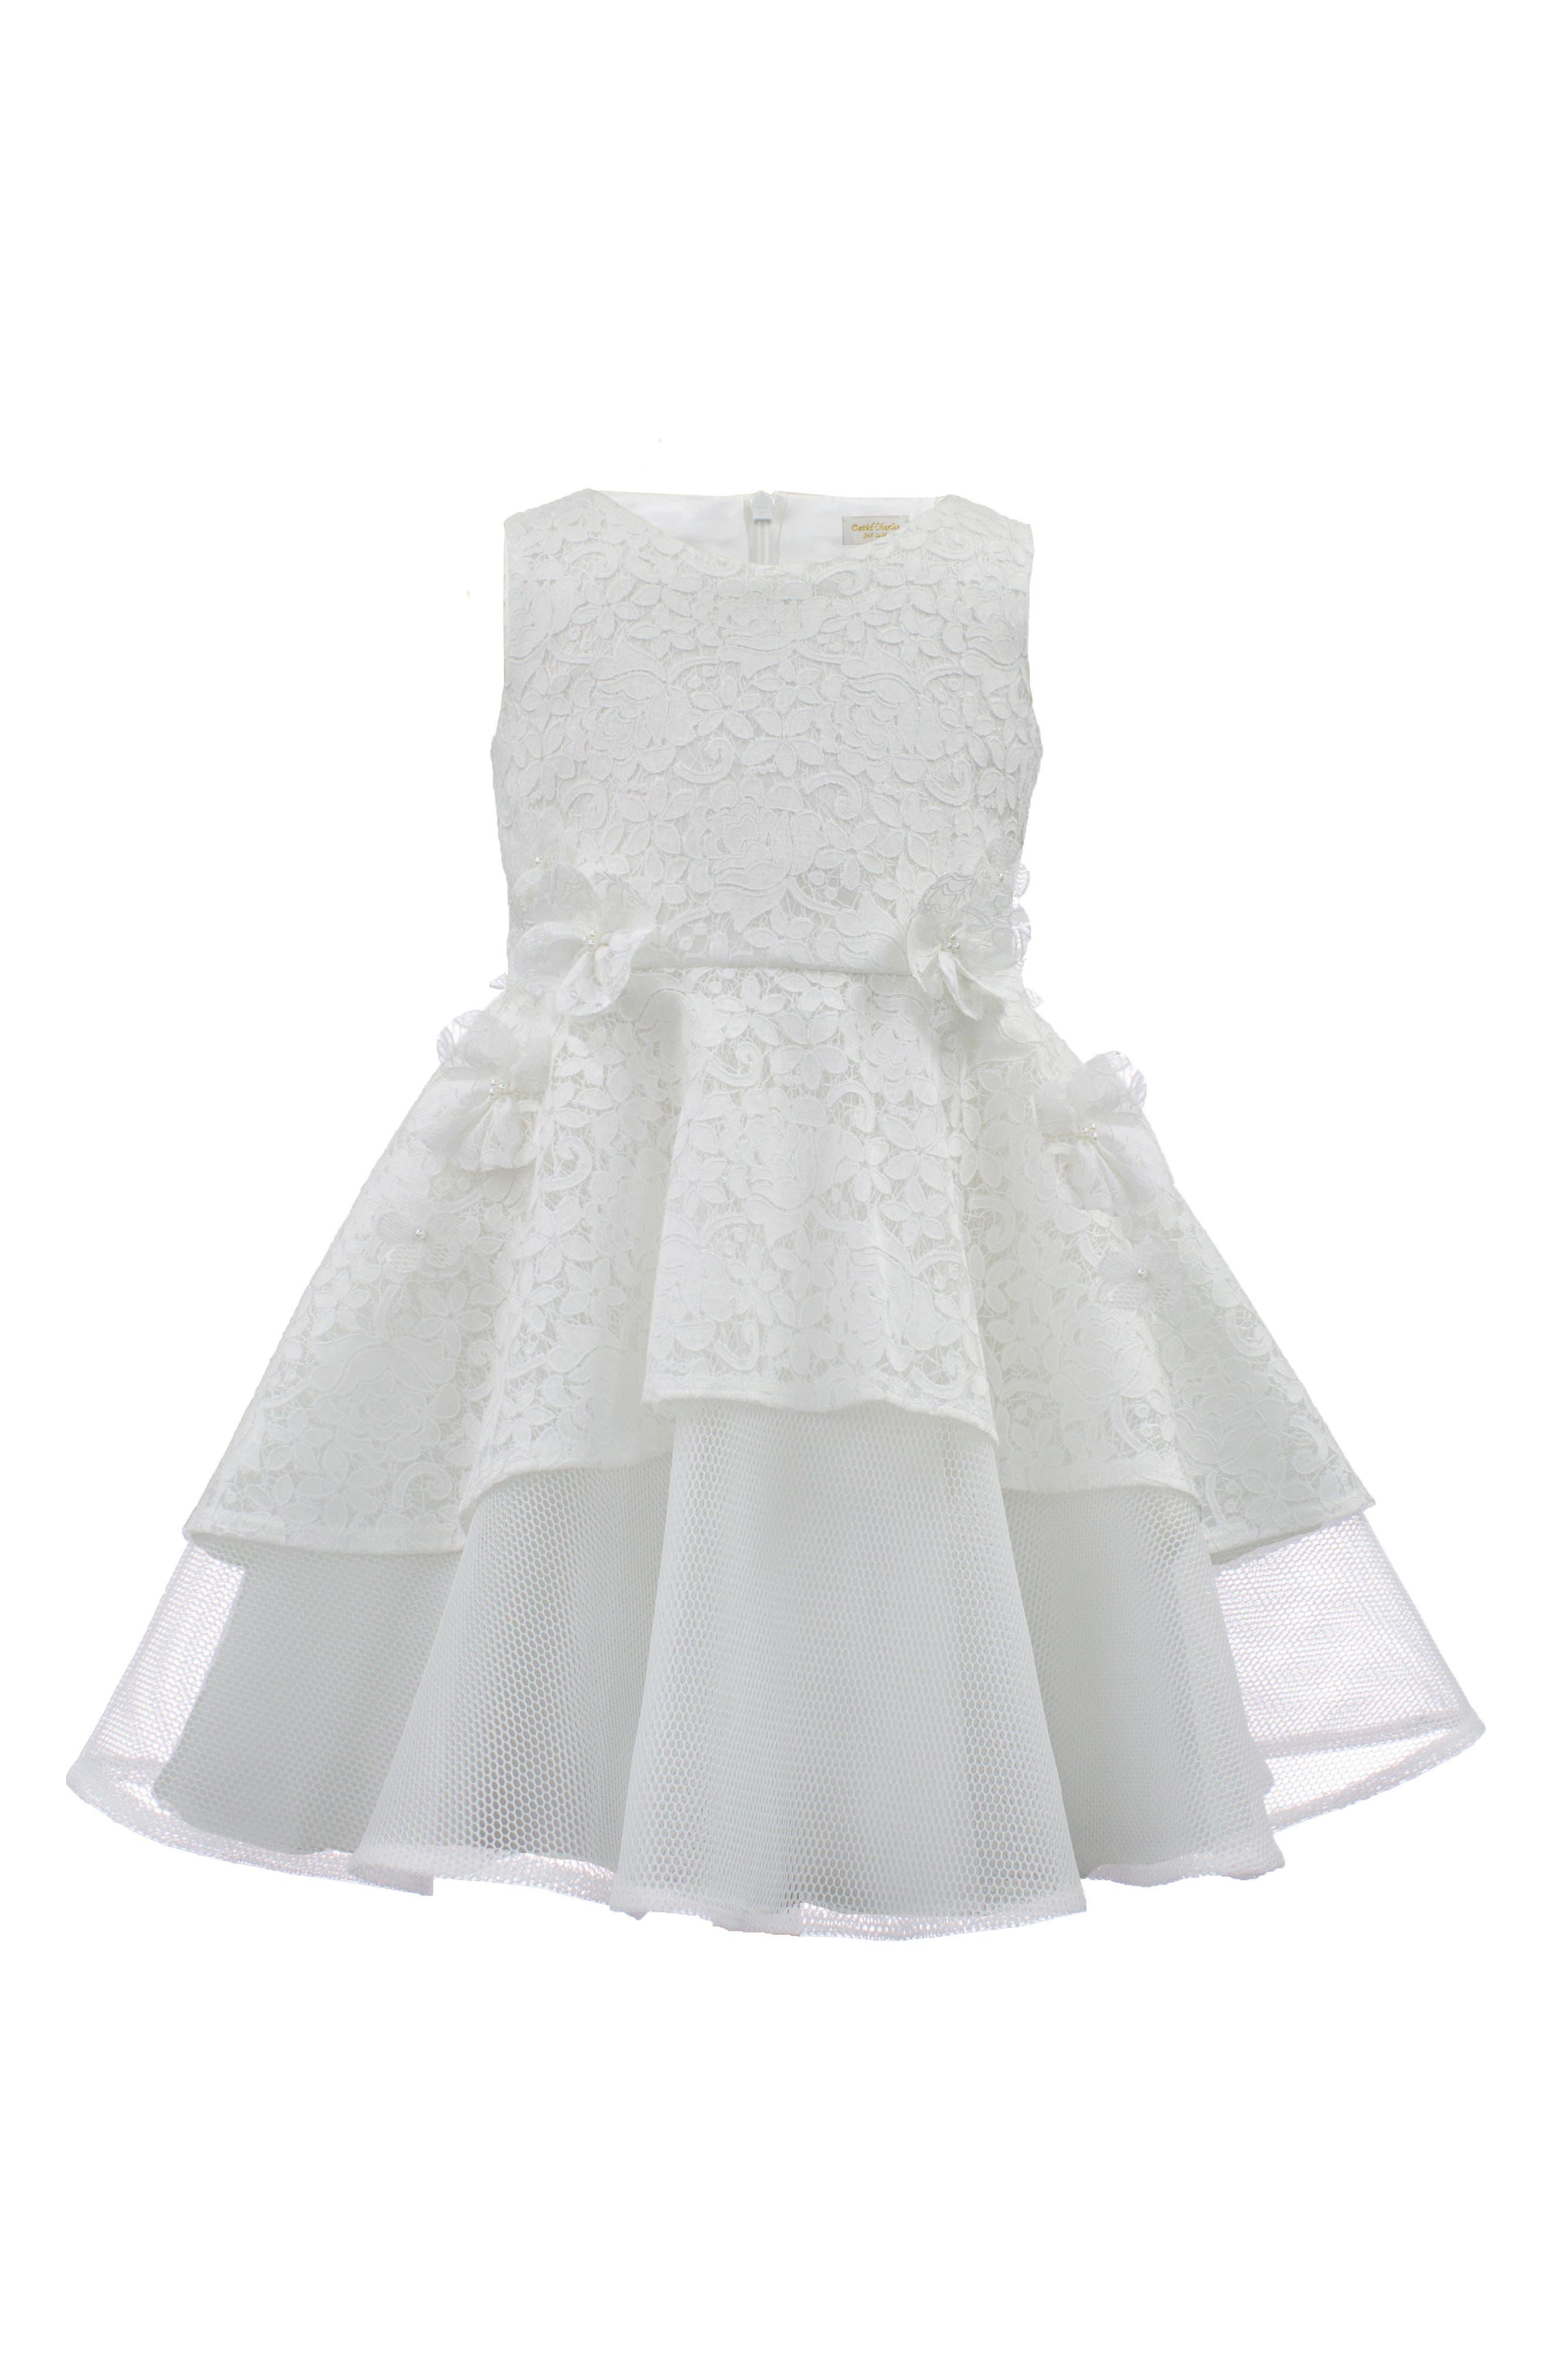 Lace & Techno Mesh Dress,                         Main,                         color, 901